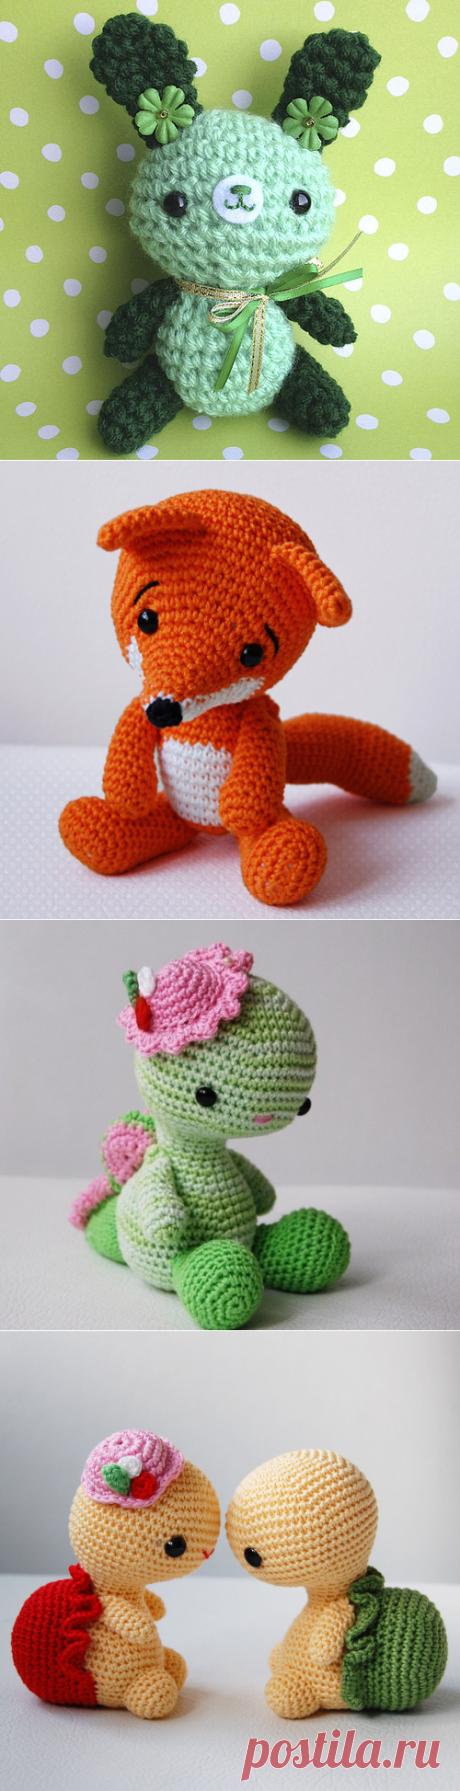 Knitted toys of an amiguruma